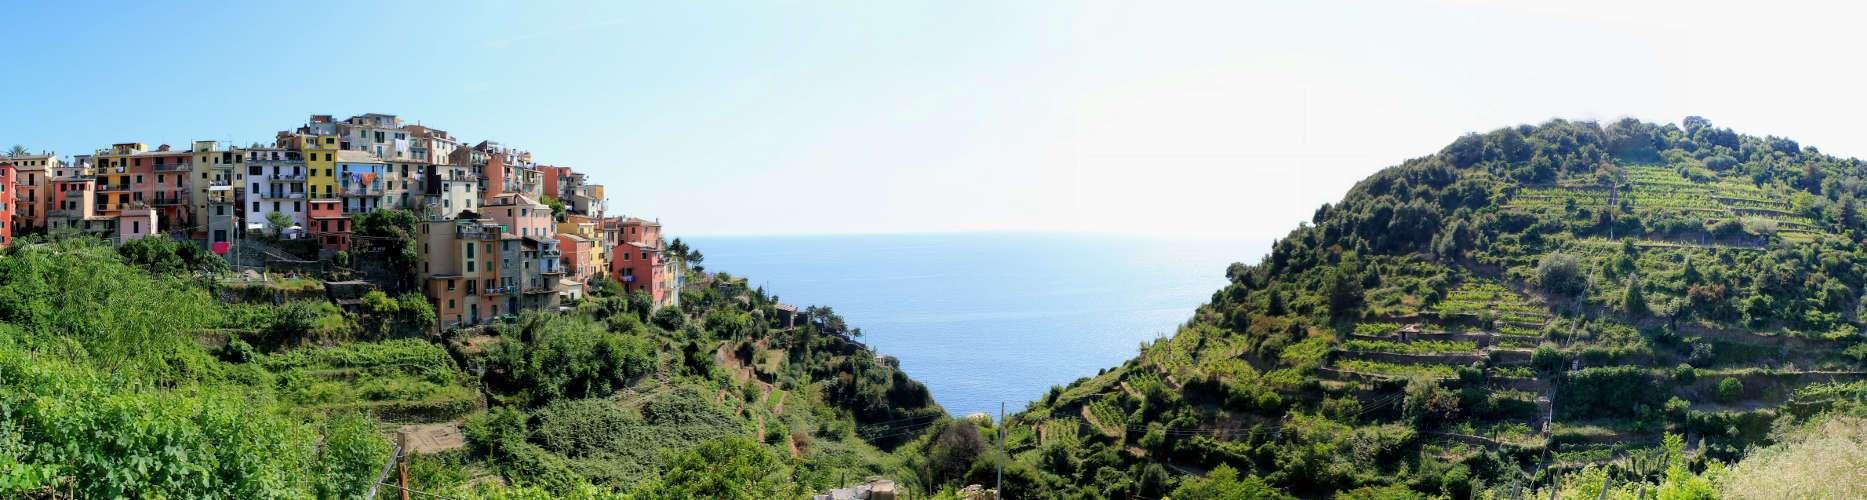 Panorámica Corniglia (Cinque Terre)